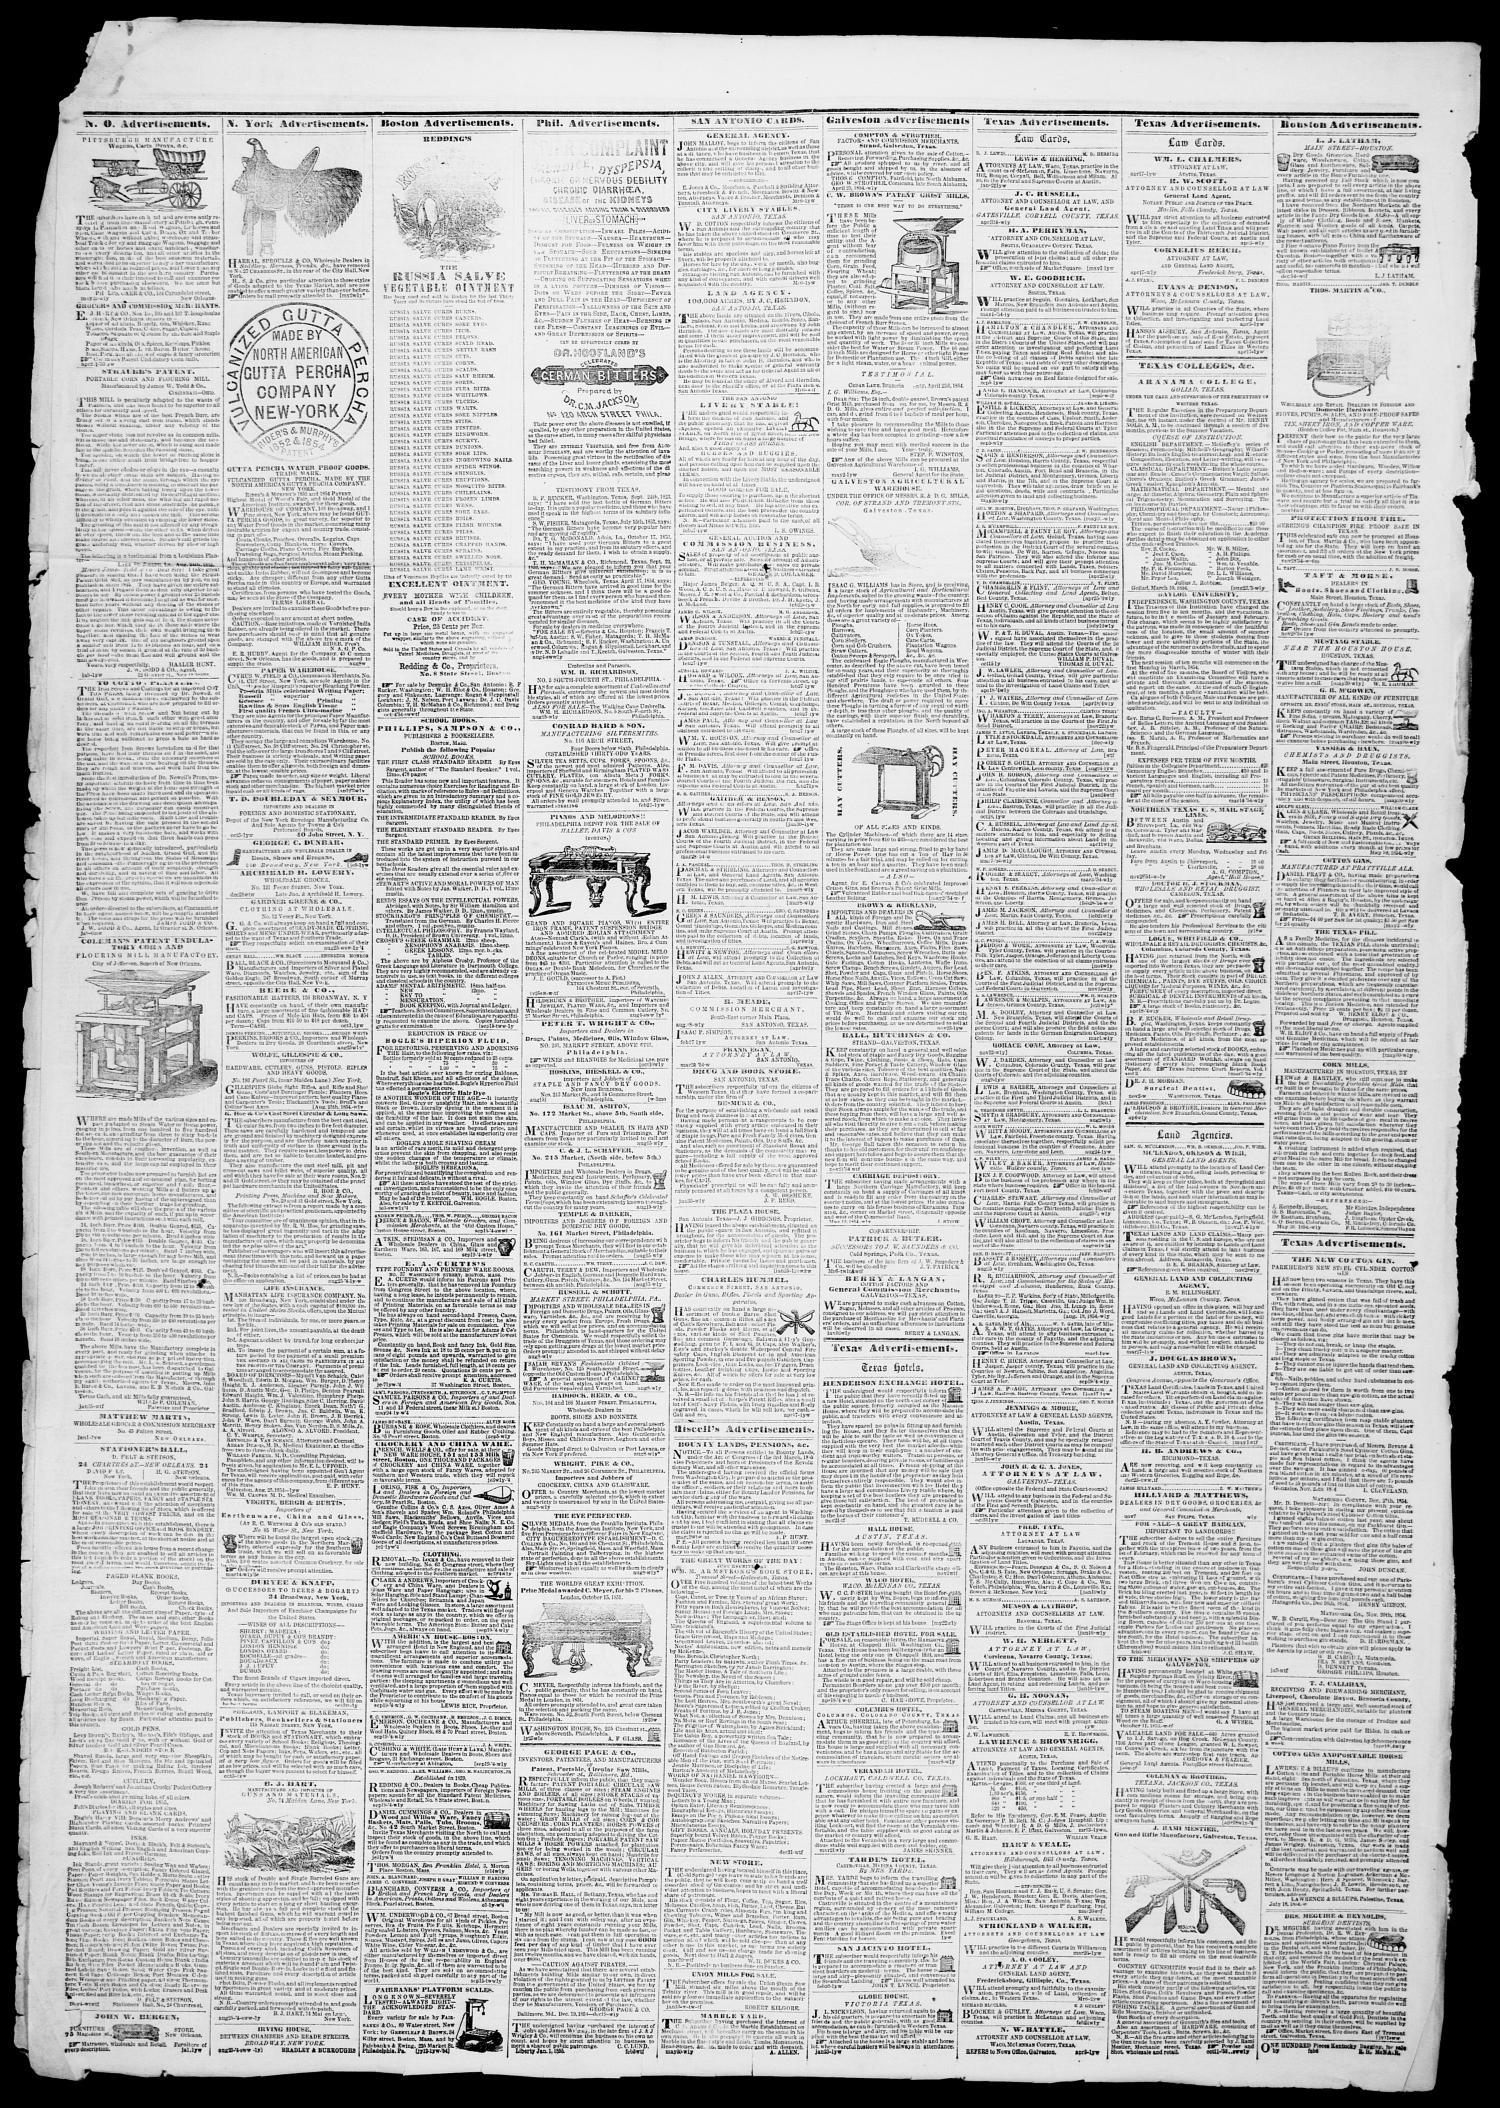 Galveston Weekly News (Galveston, Tex ), Vol  12, No  9, Ed